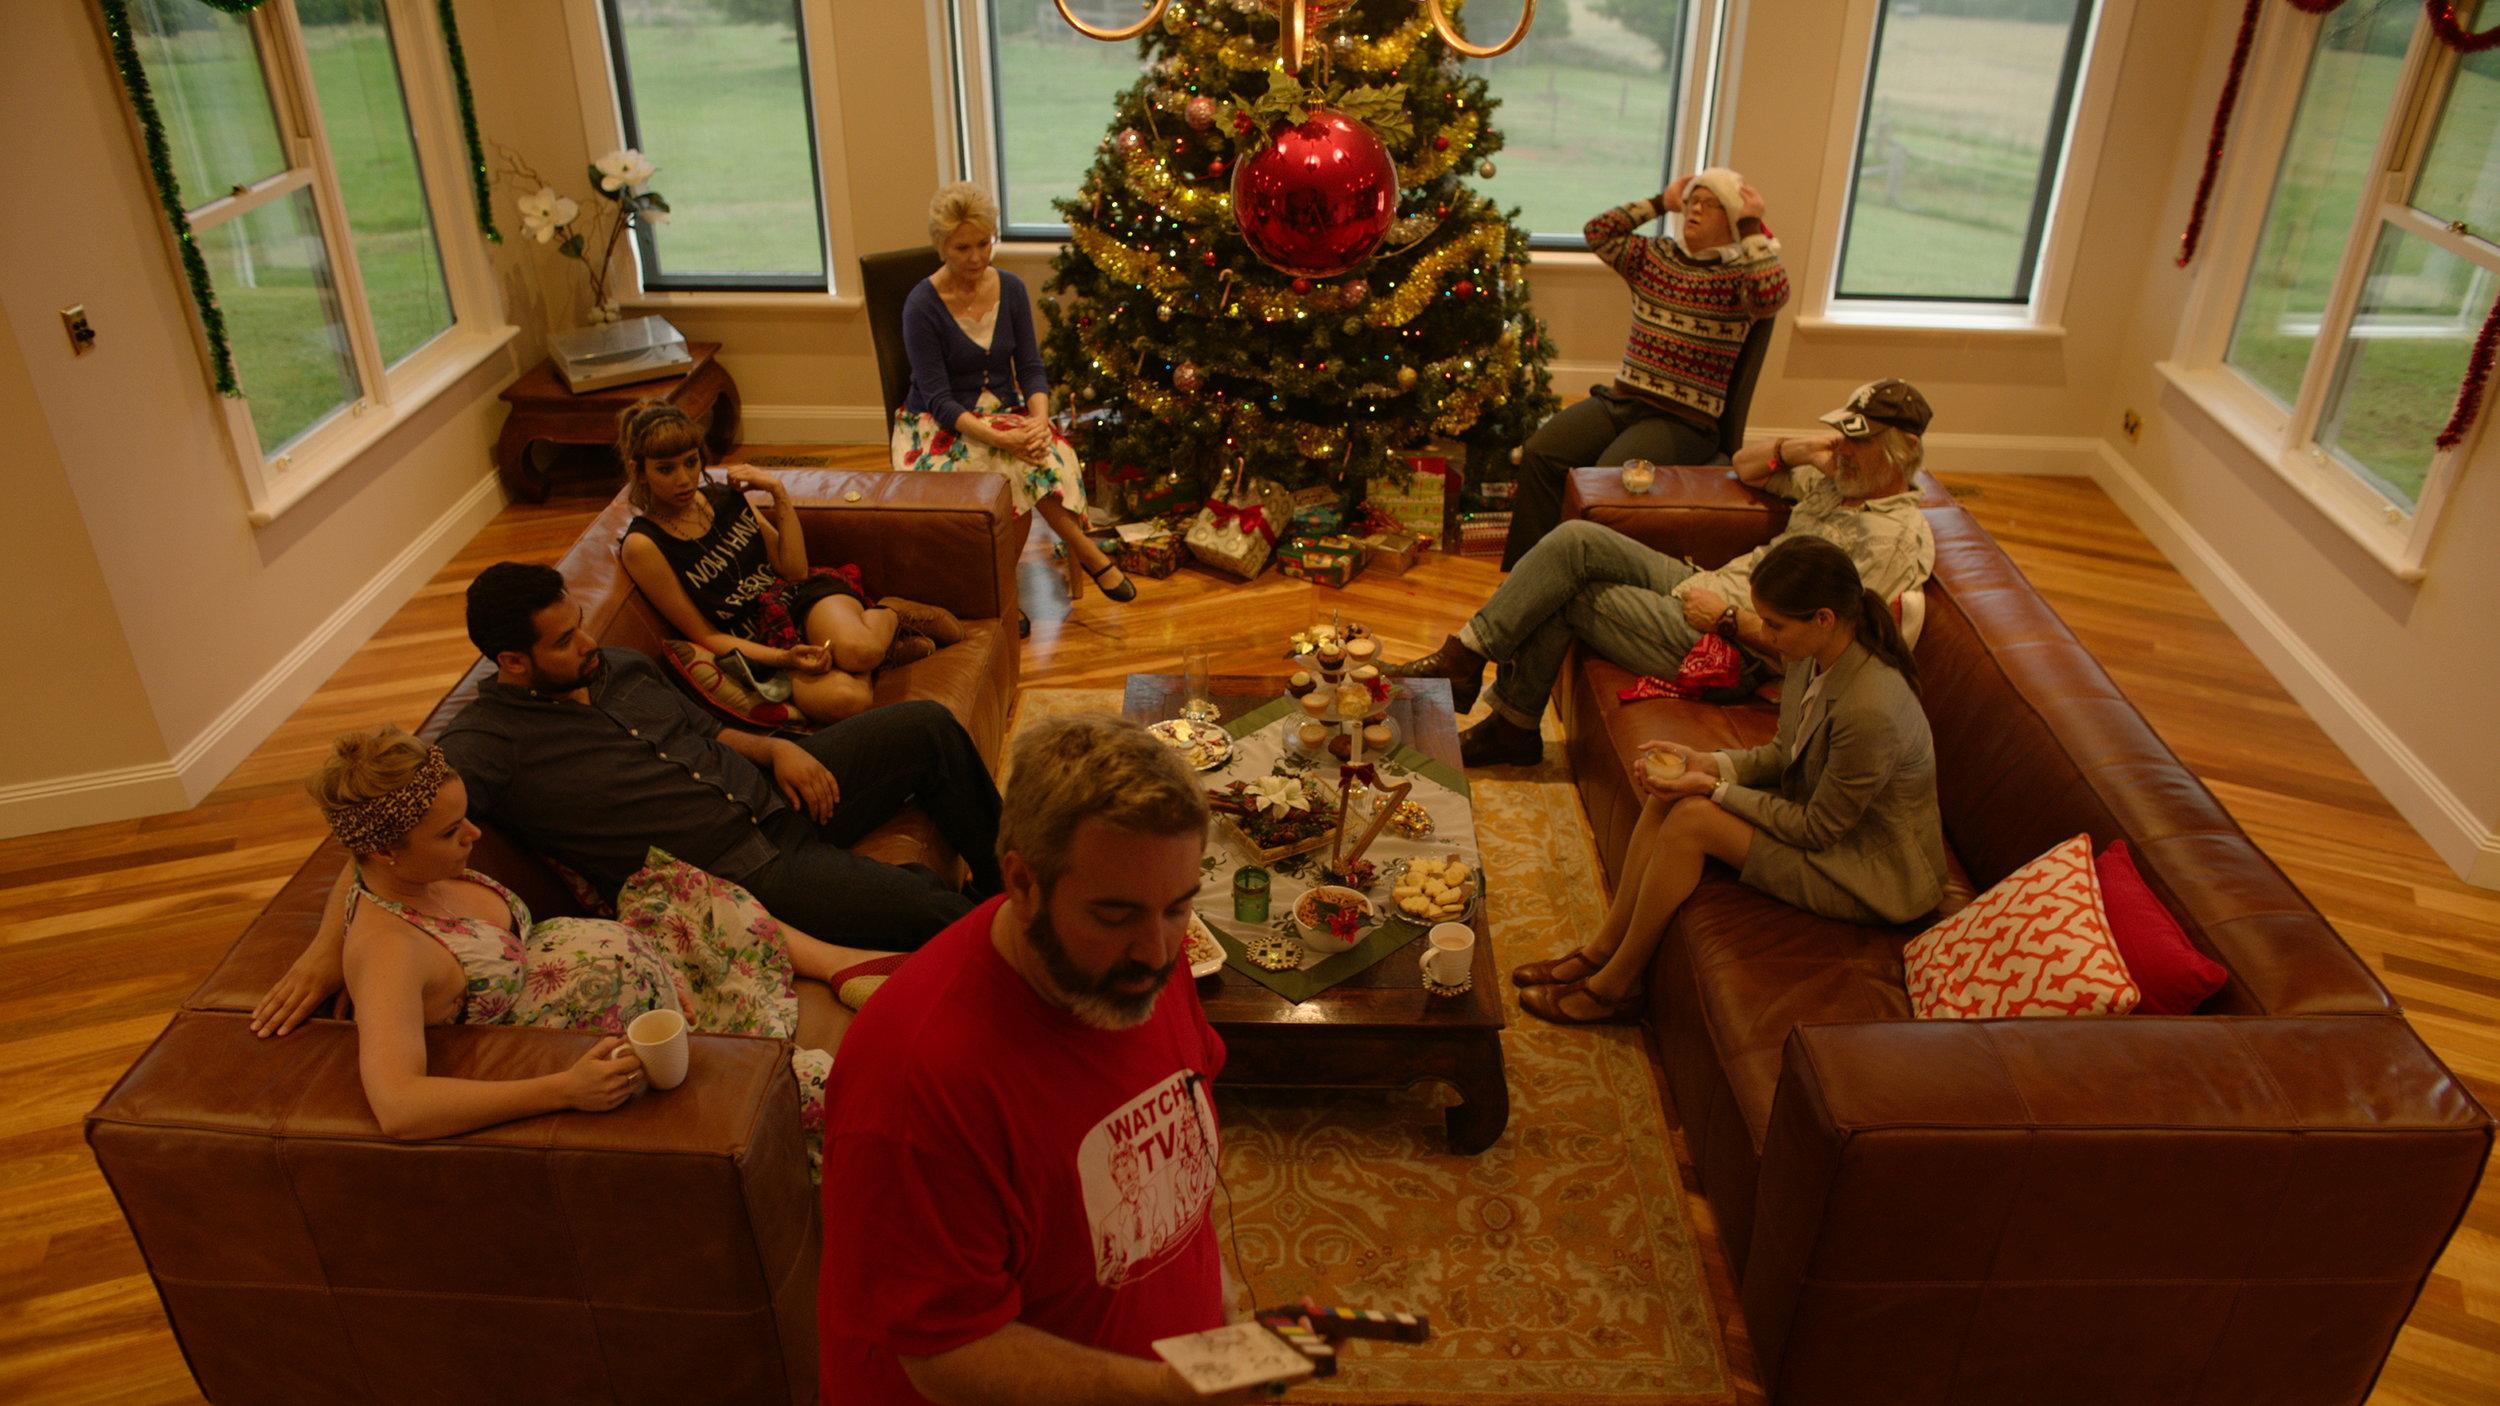 BTS - Cast at Tree w Director Craig Anderson  - Red Christmas Photo by Douglas Burdorff.jpeg